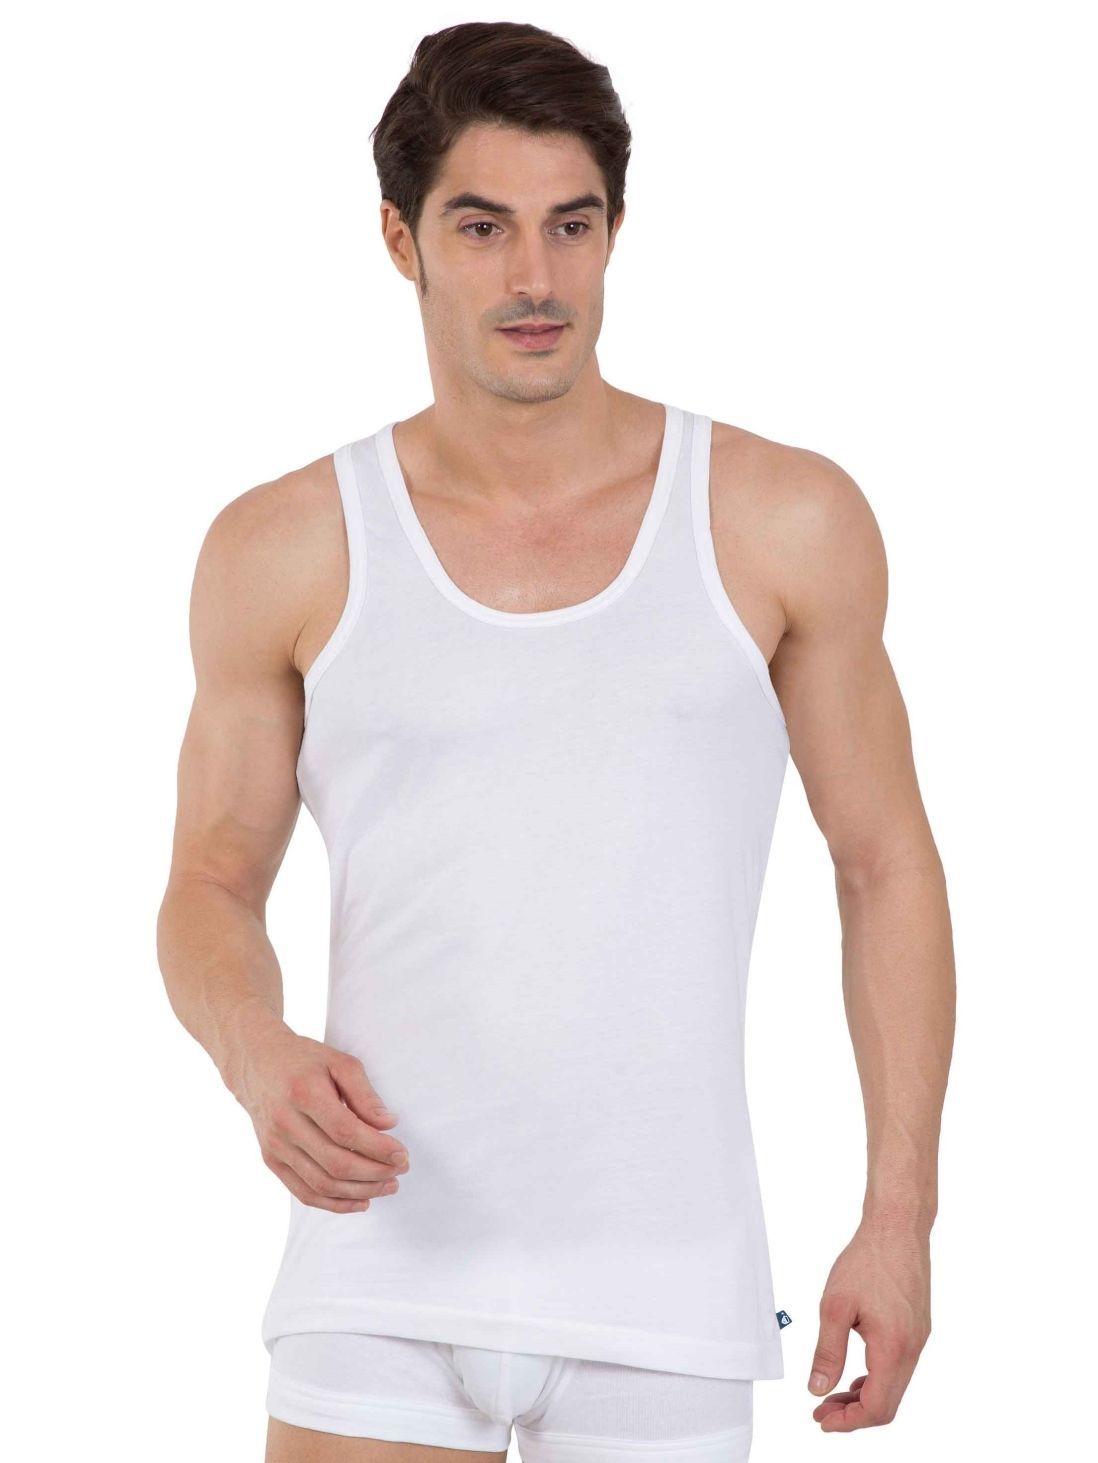 0b6aeac9 Jockey White Sleeveless Cotton Vest Basic Undershirt - Style #8820 Innerwear